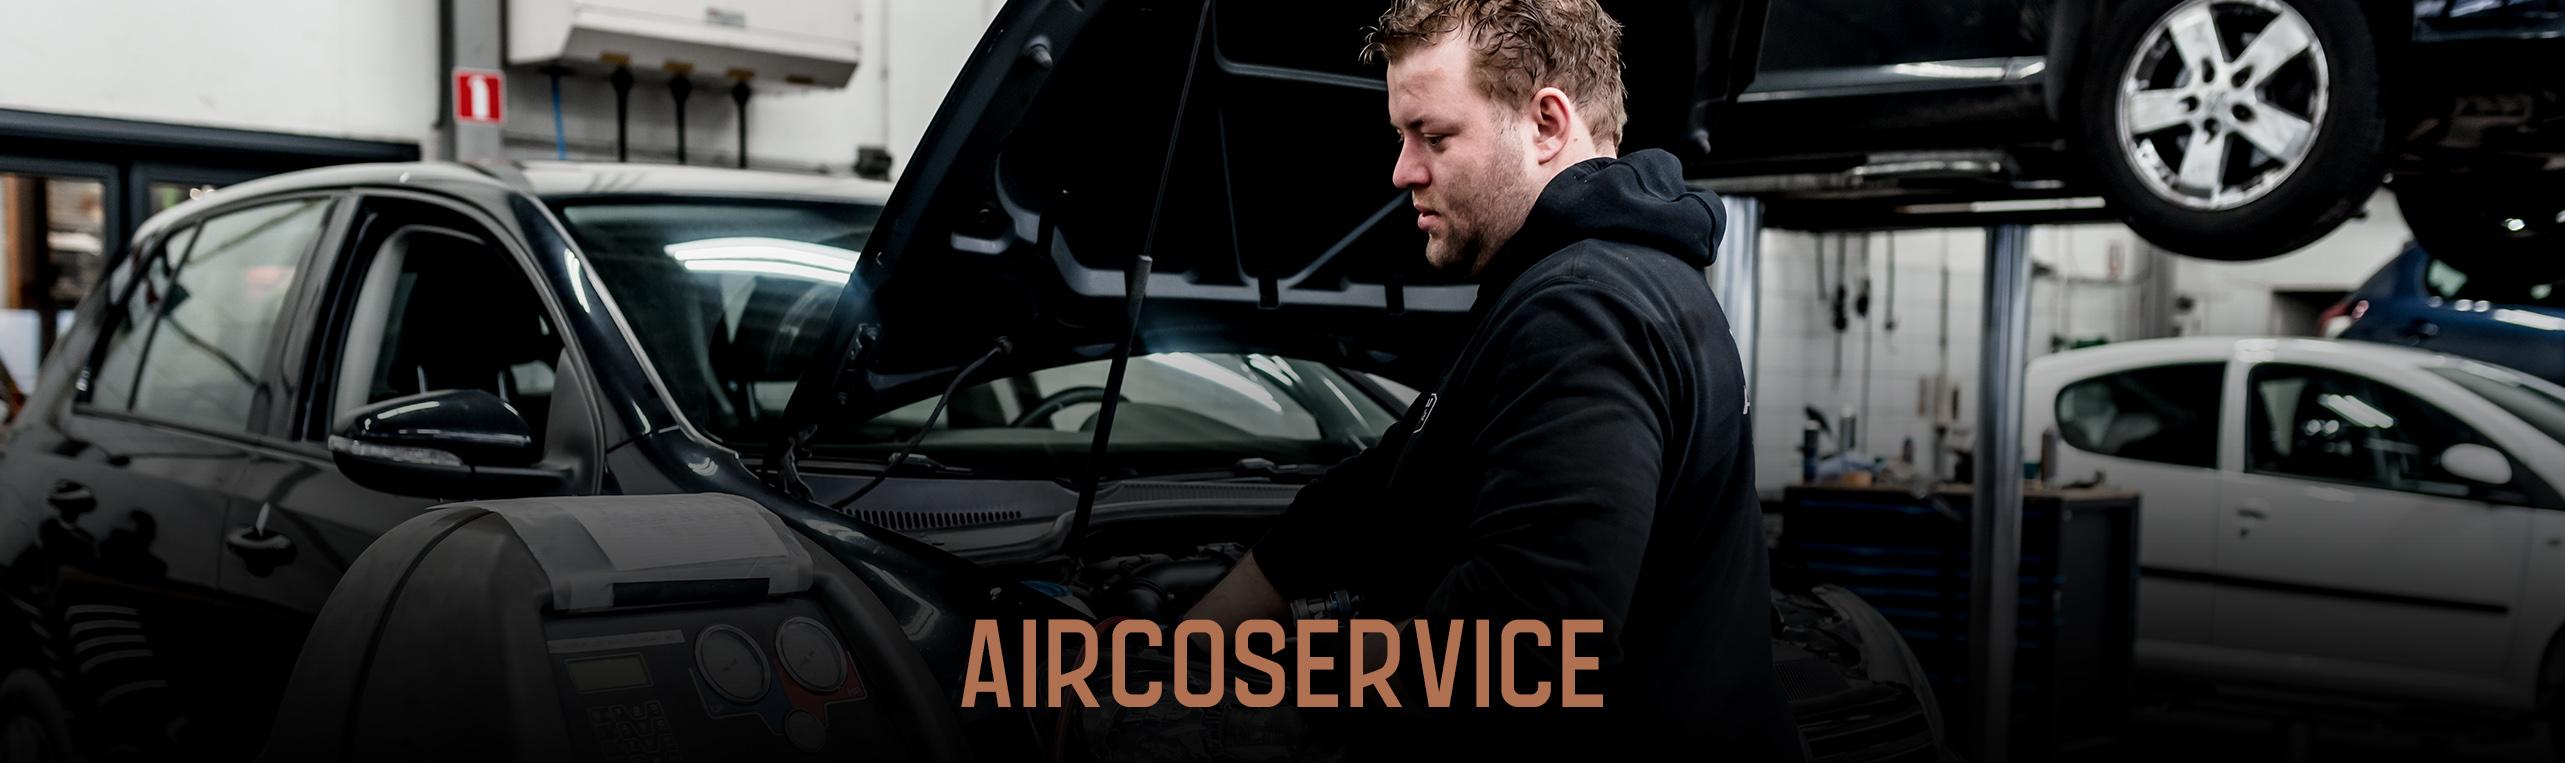 Aircoservice